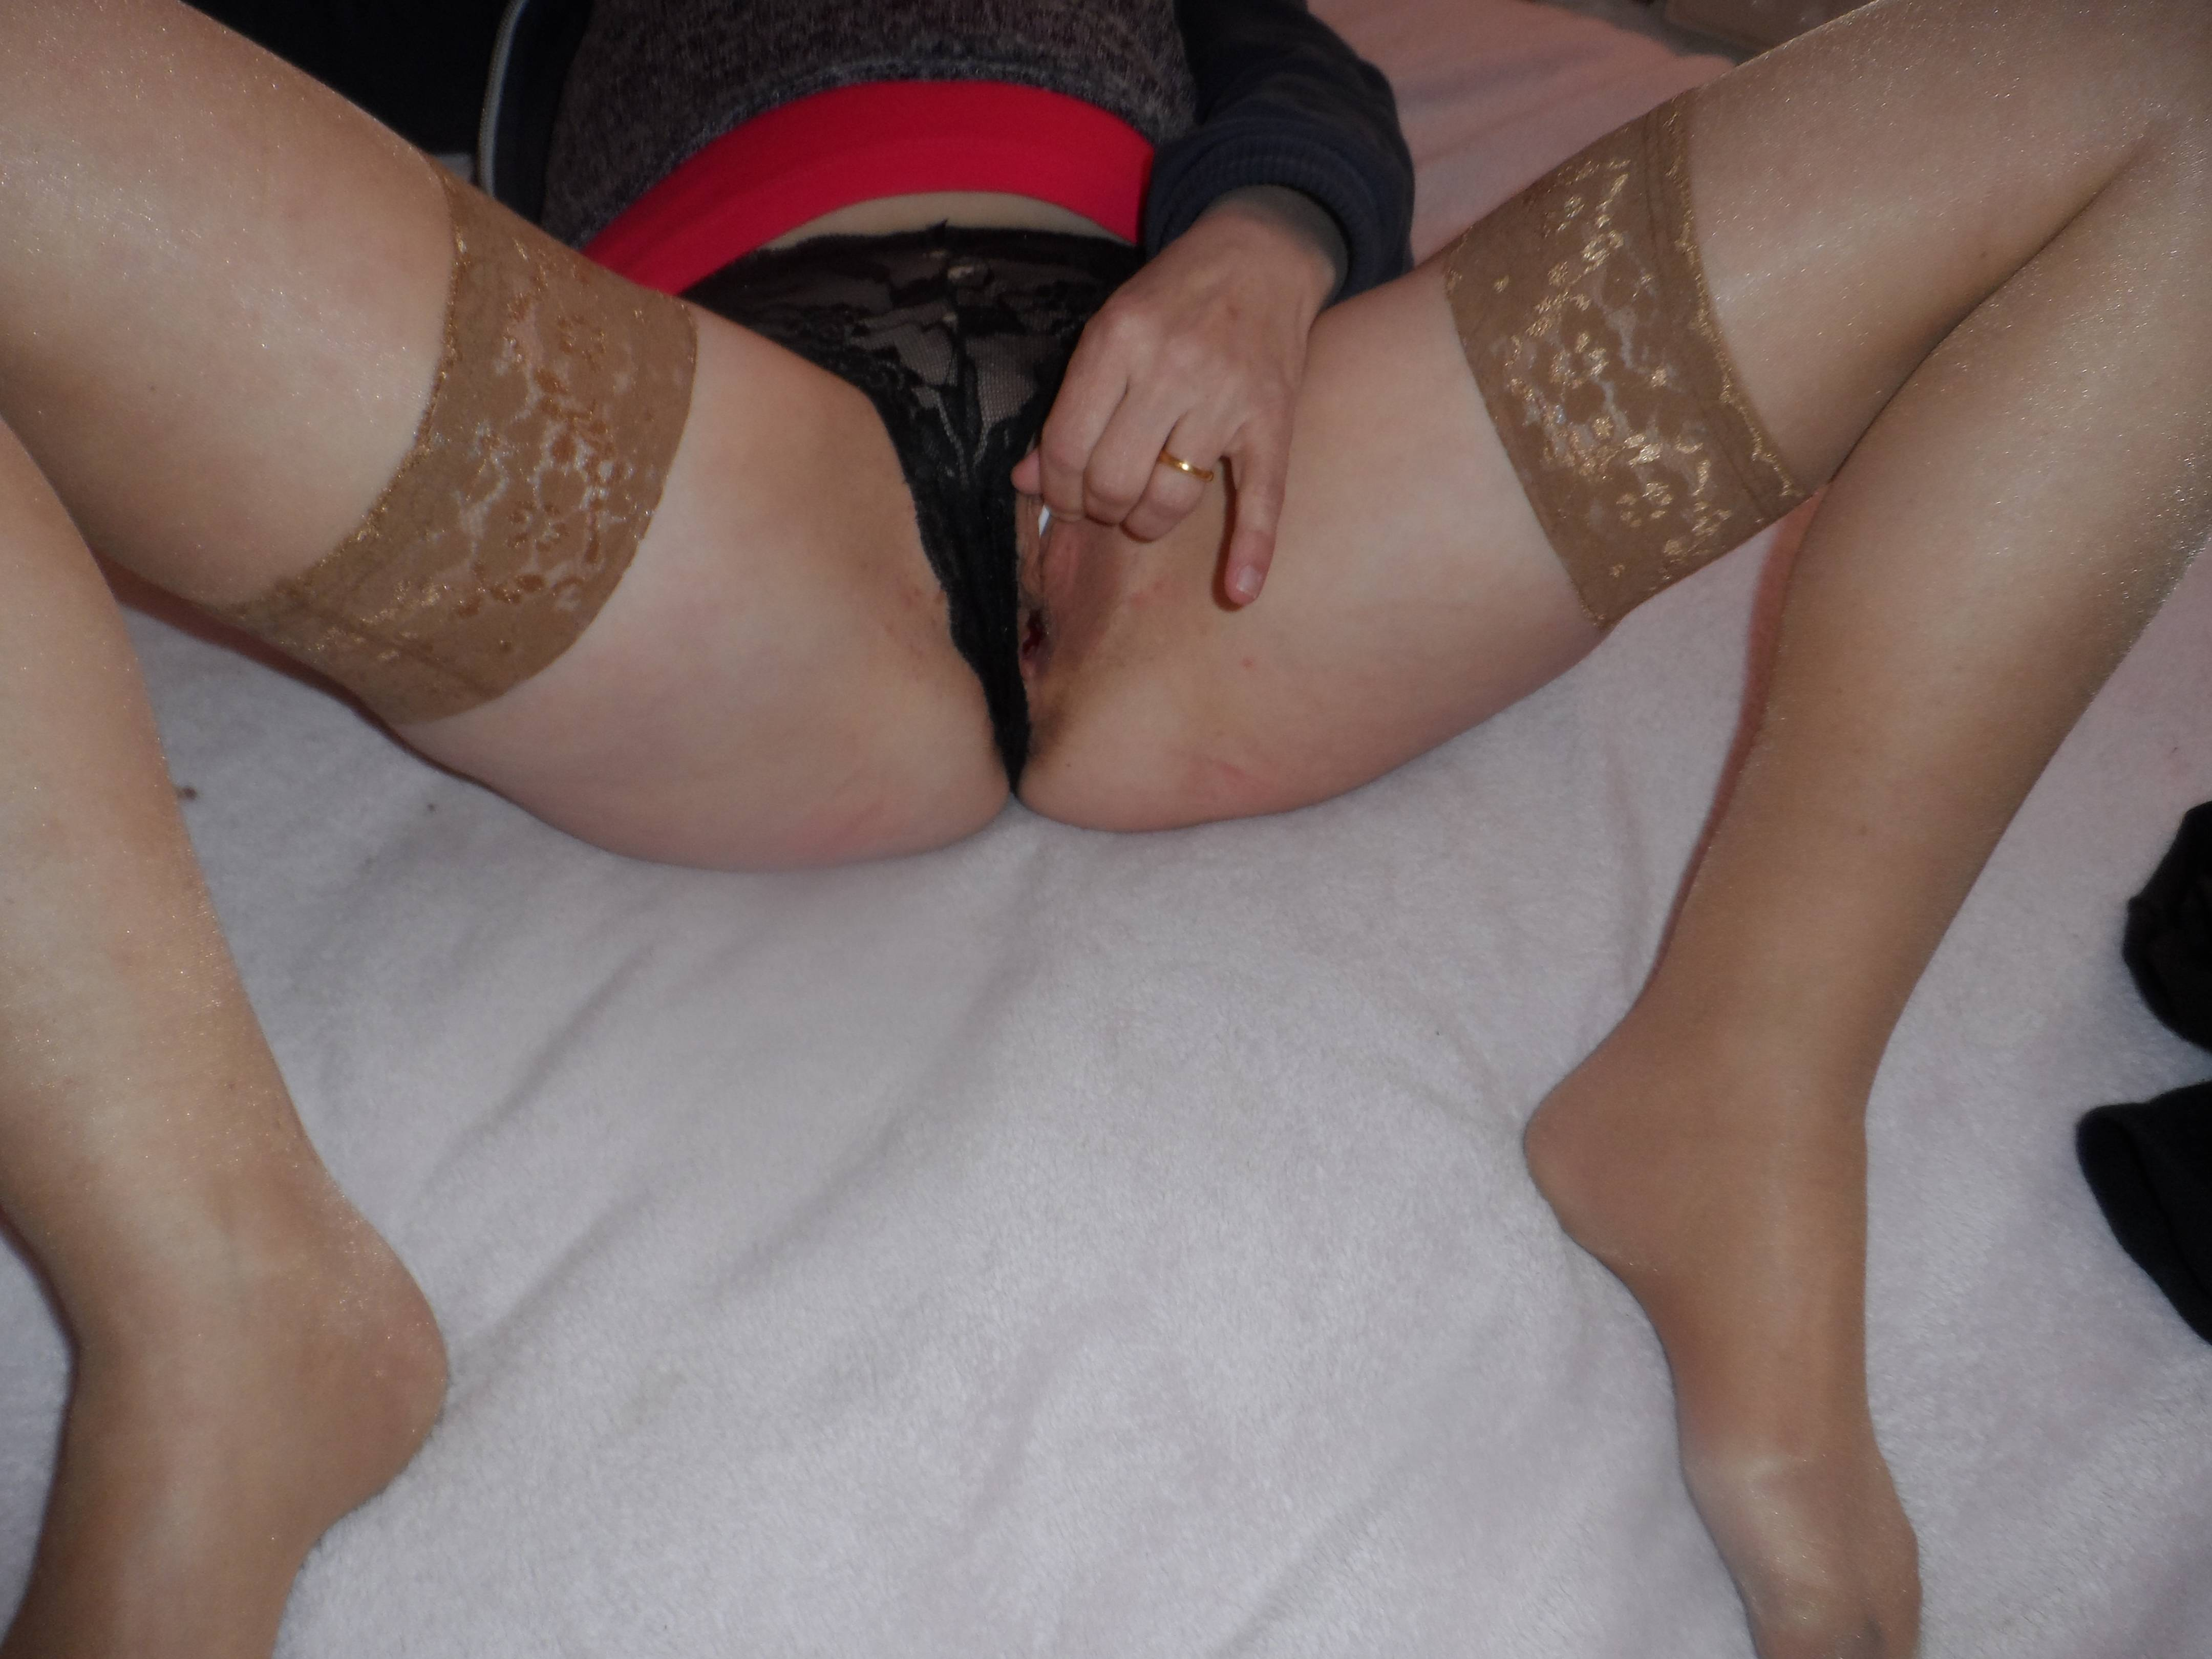 used-panties-black-lace-cum-soaked_stuffed_06